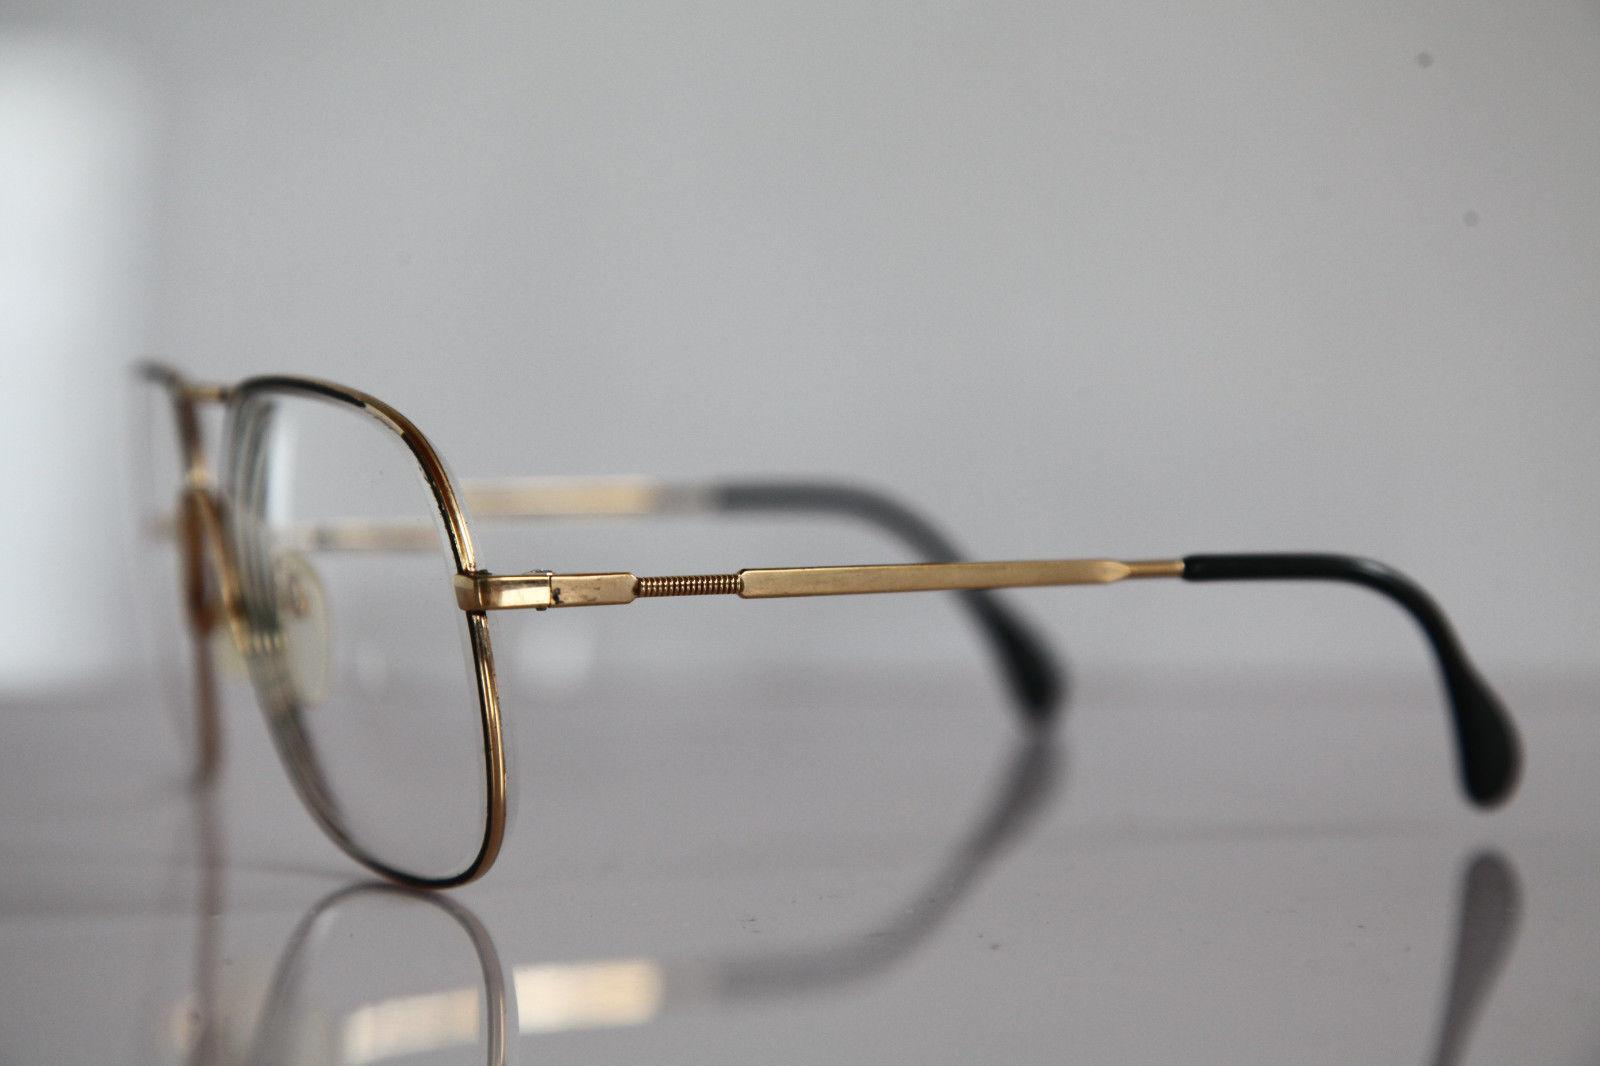 Vintage SILHOUETTE Eyewear, Gold Frame,  RX-Able Lenses Prescription. Austria 2